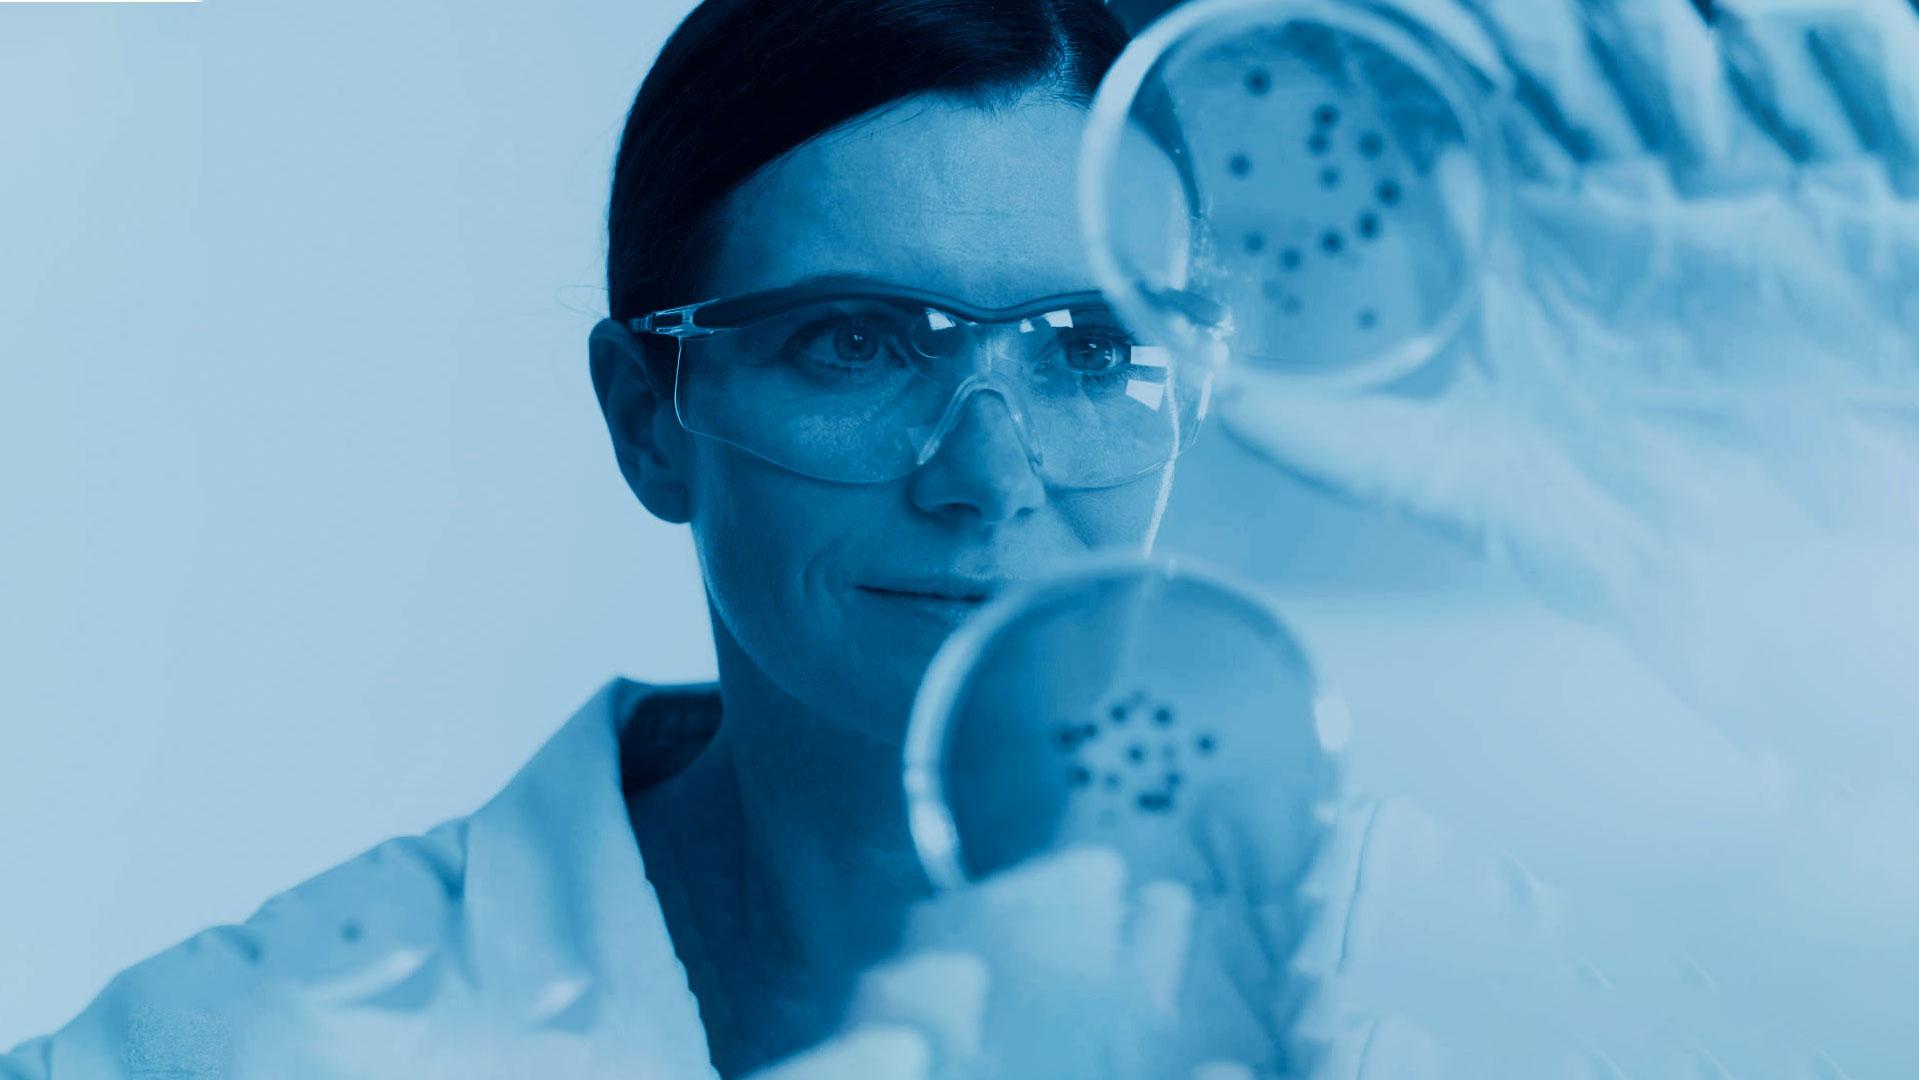 A scientist looking at a Petri dish